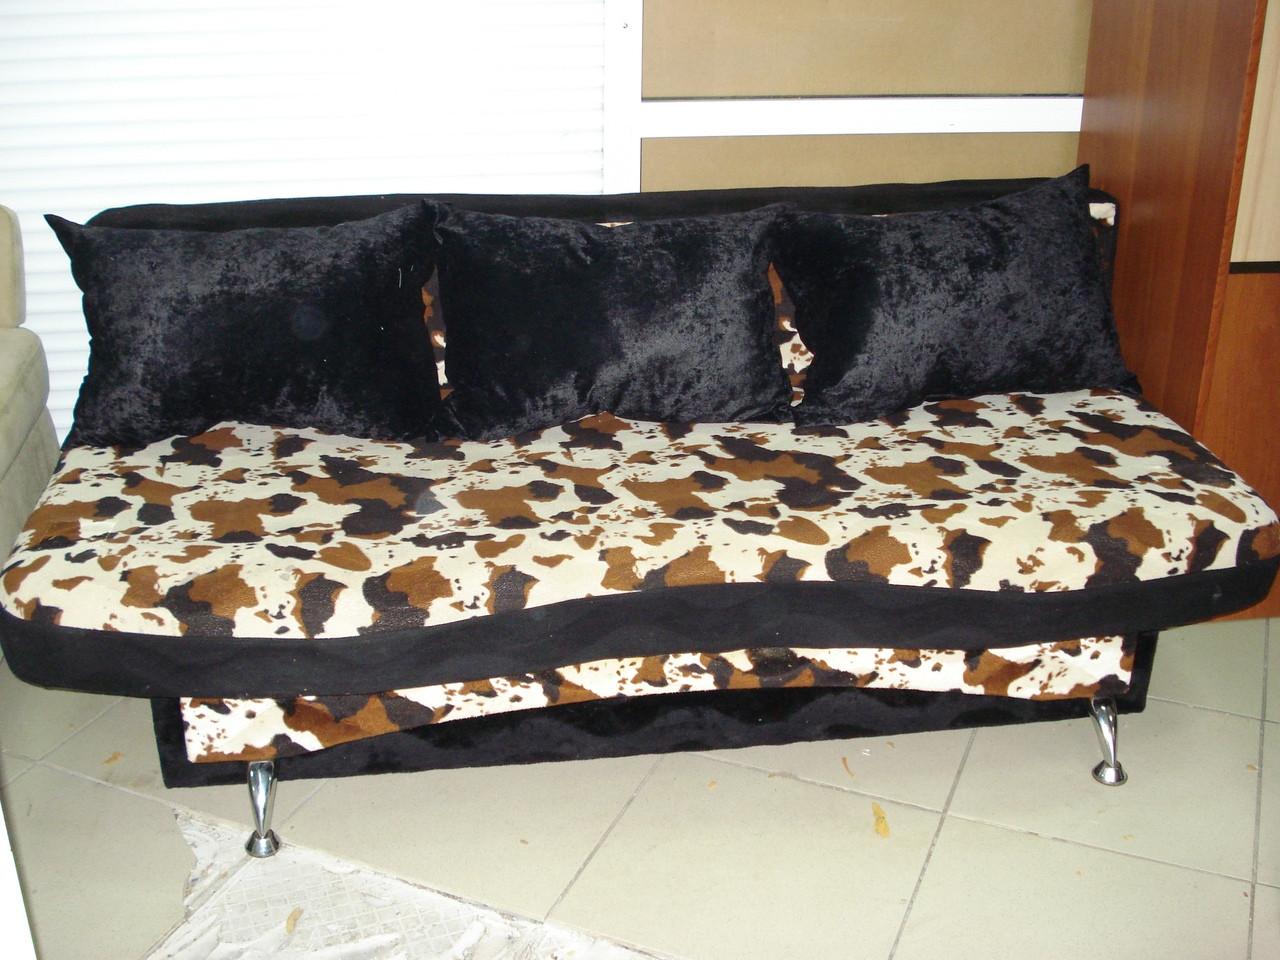 Диван-еврокнижка б/у, диван с принтом в комнату б/у, фото 1